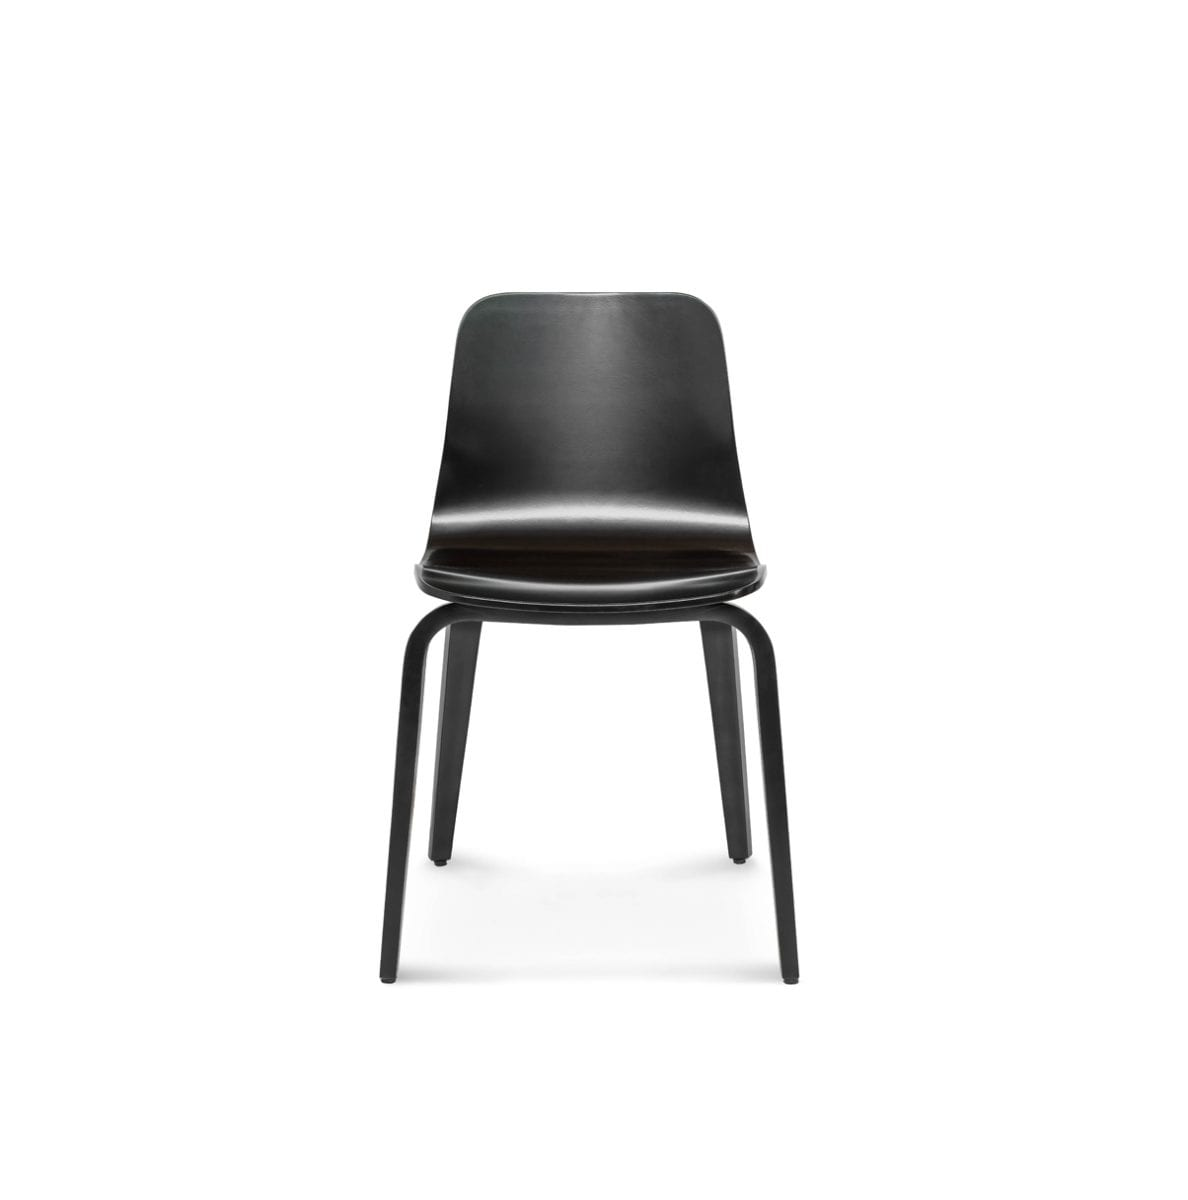 Fameg_krzesło_A-1802_Hips